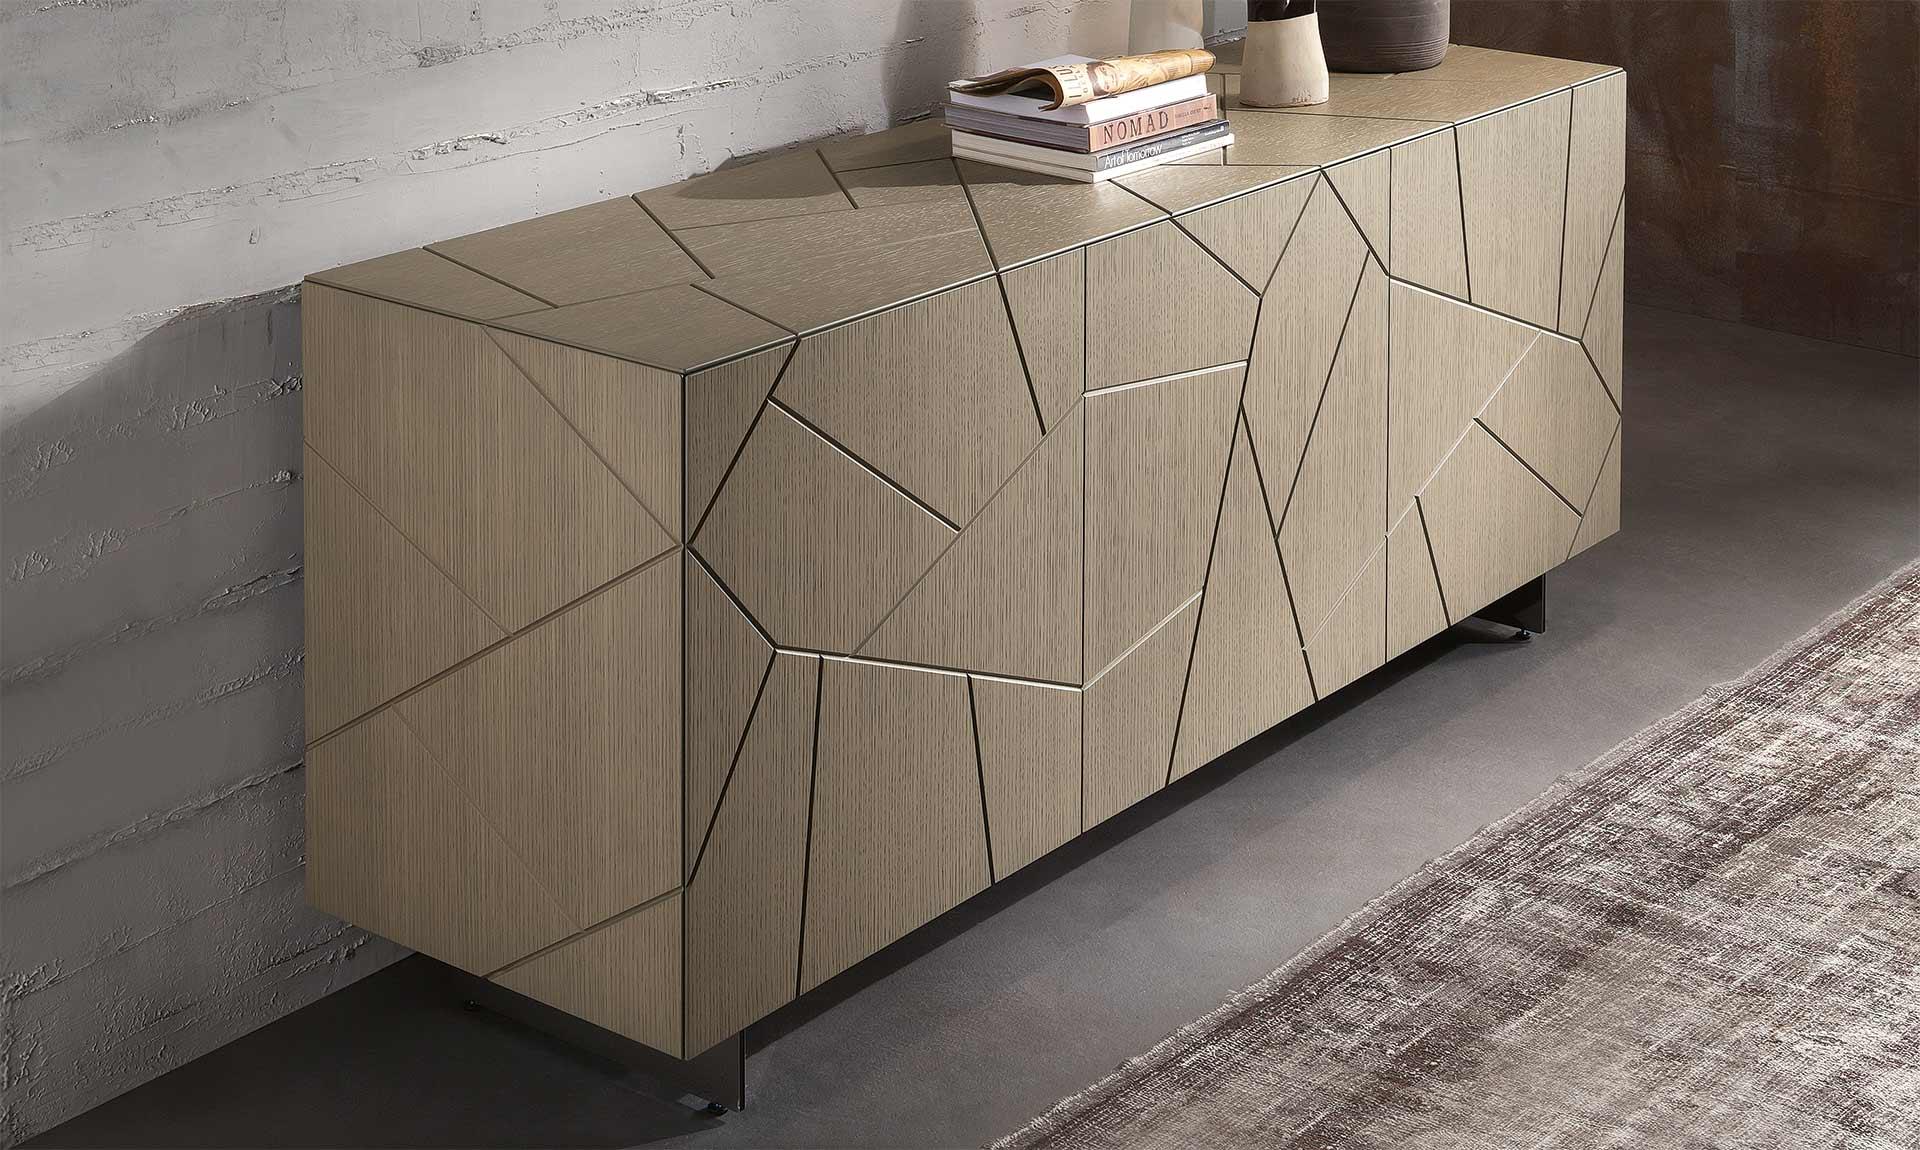 buffet haut de gamme maison design. Black Bedroom Furniture Sets. Home Design Ideas